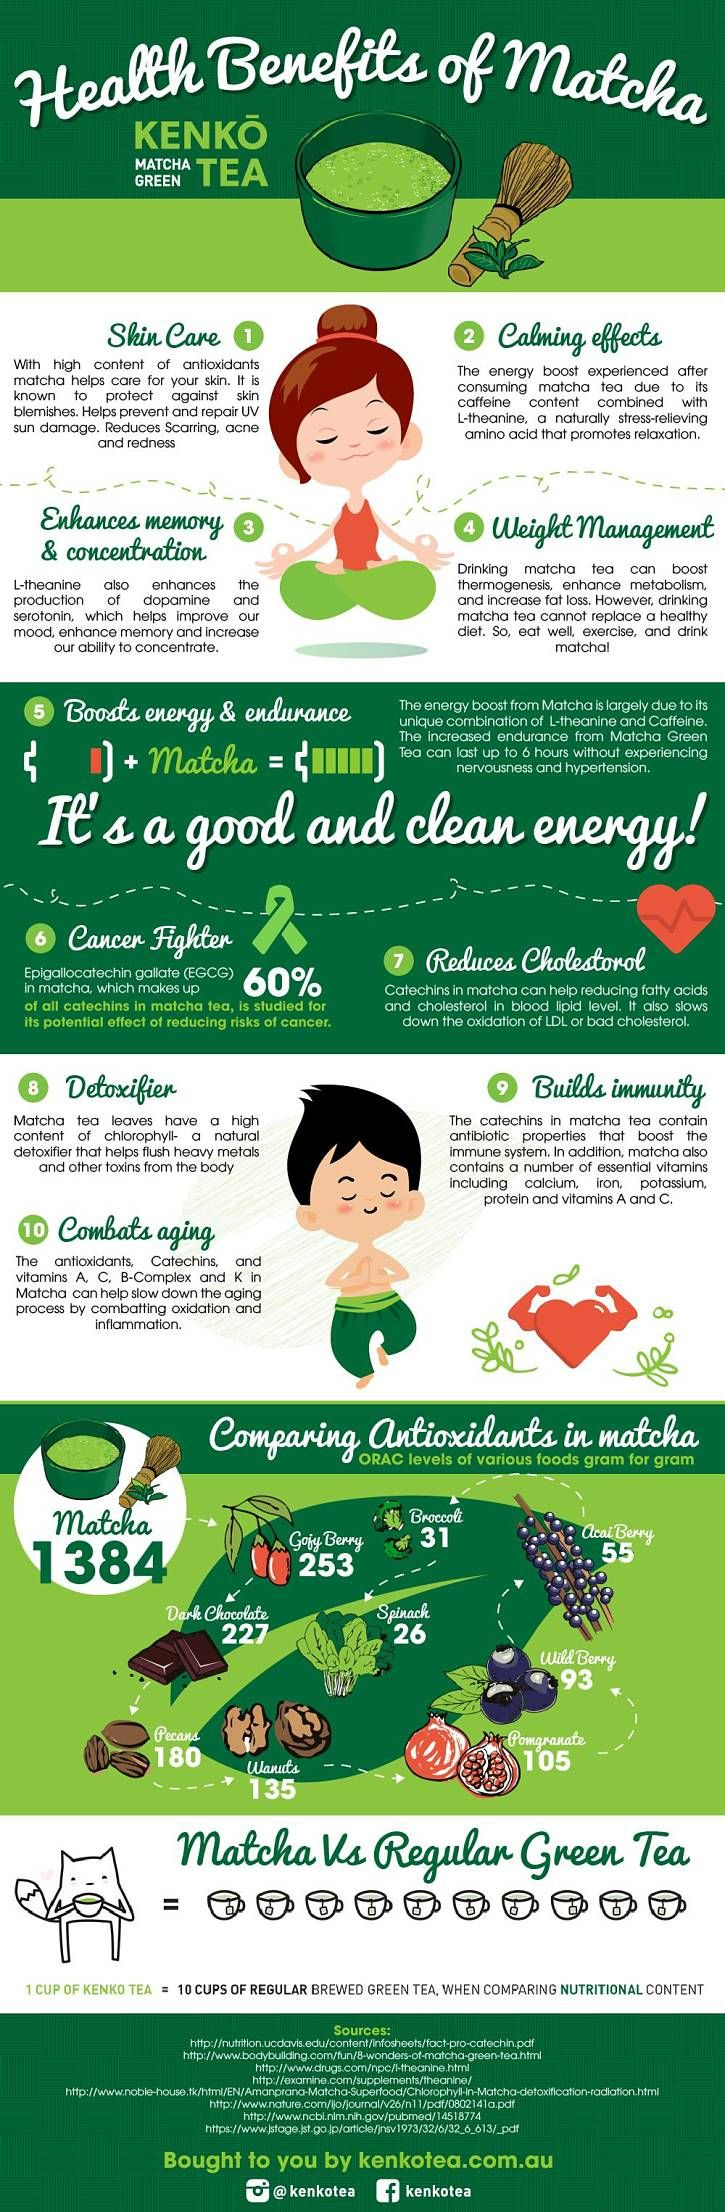 Matcha Green Tea health Benefits Infographic by Kenko tea I am really loving matcha tea!❤️